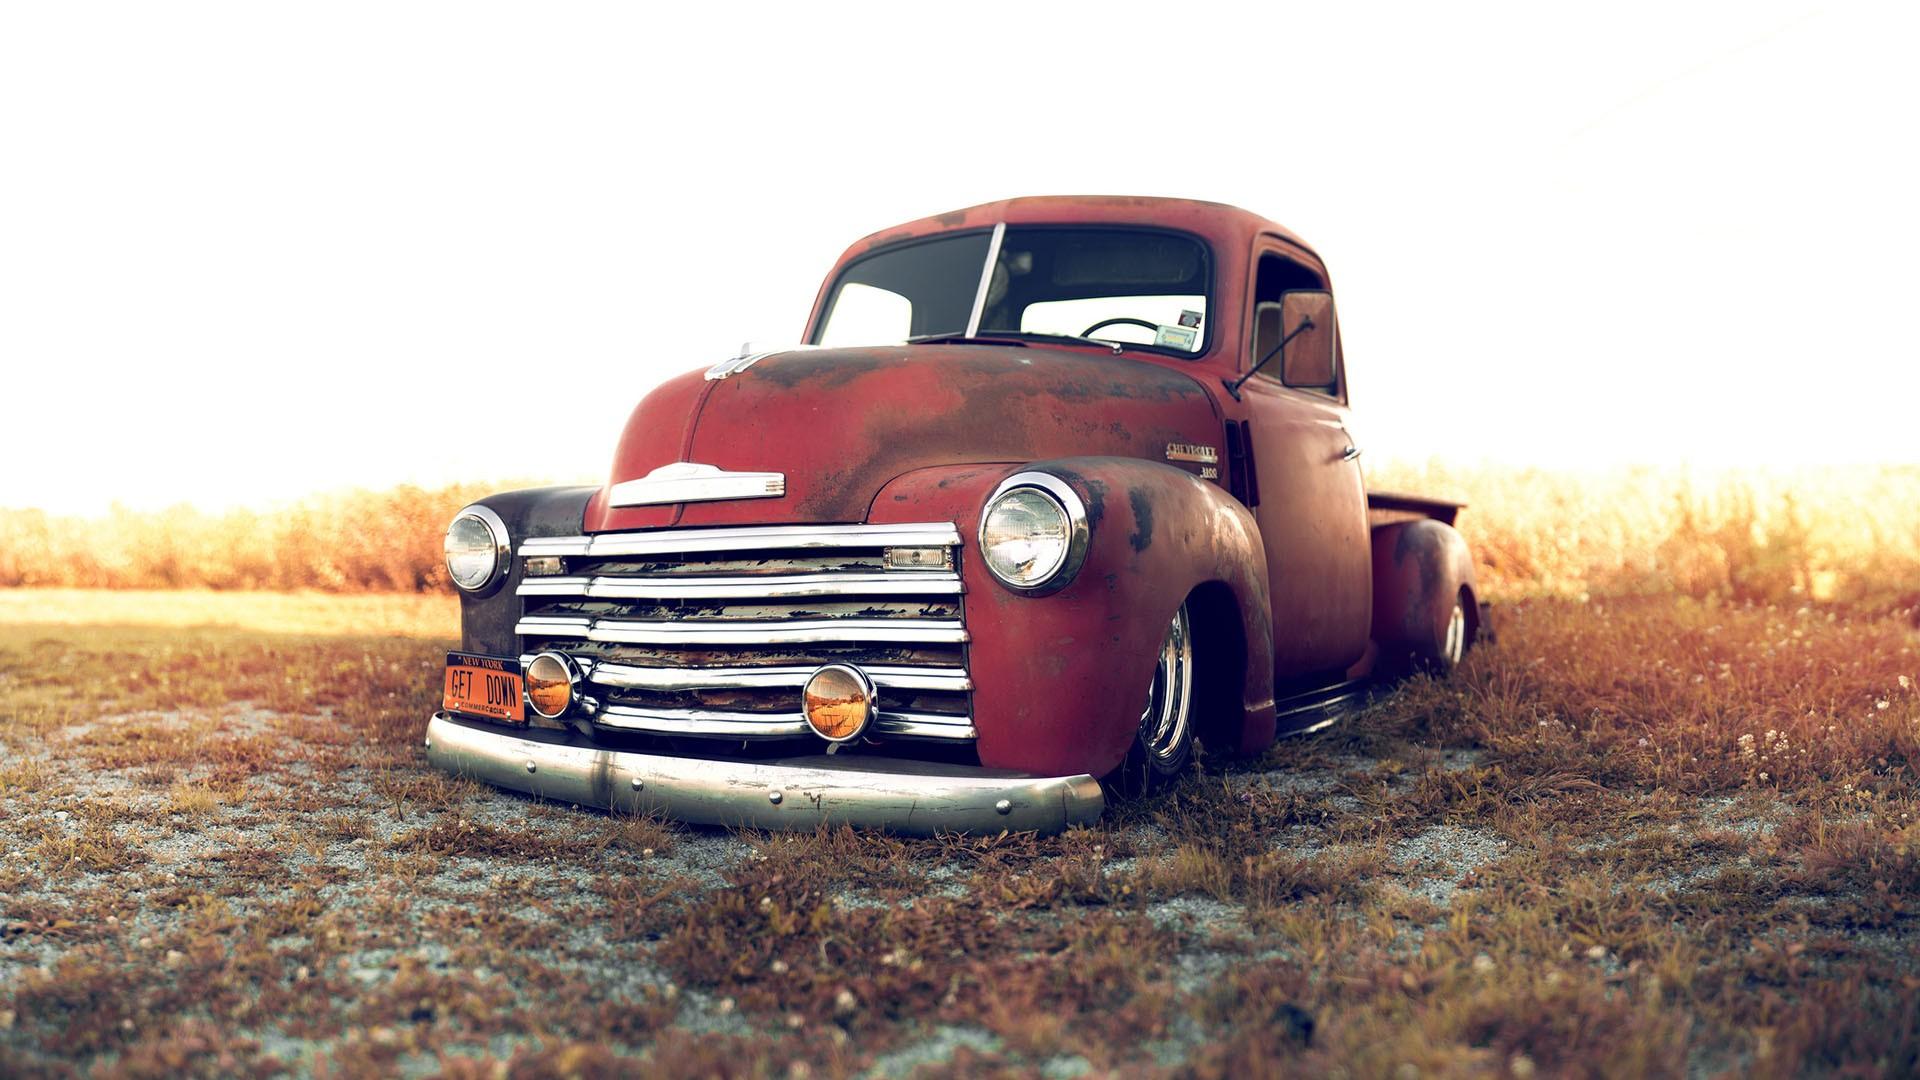 chevrolet trucks lowriders custom classic cars wallpaper background 1920x1080